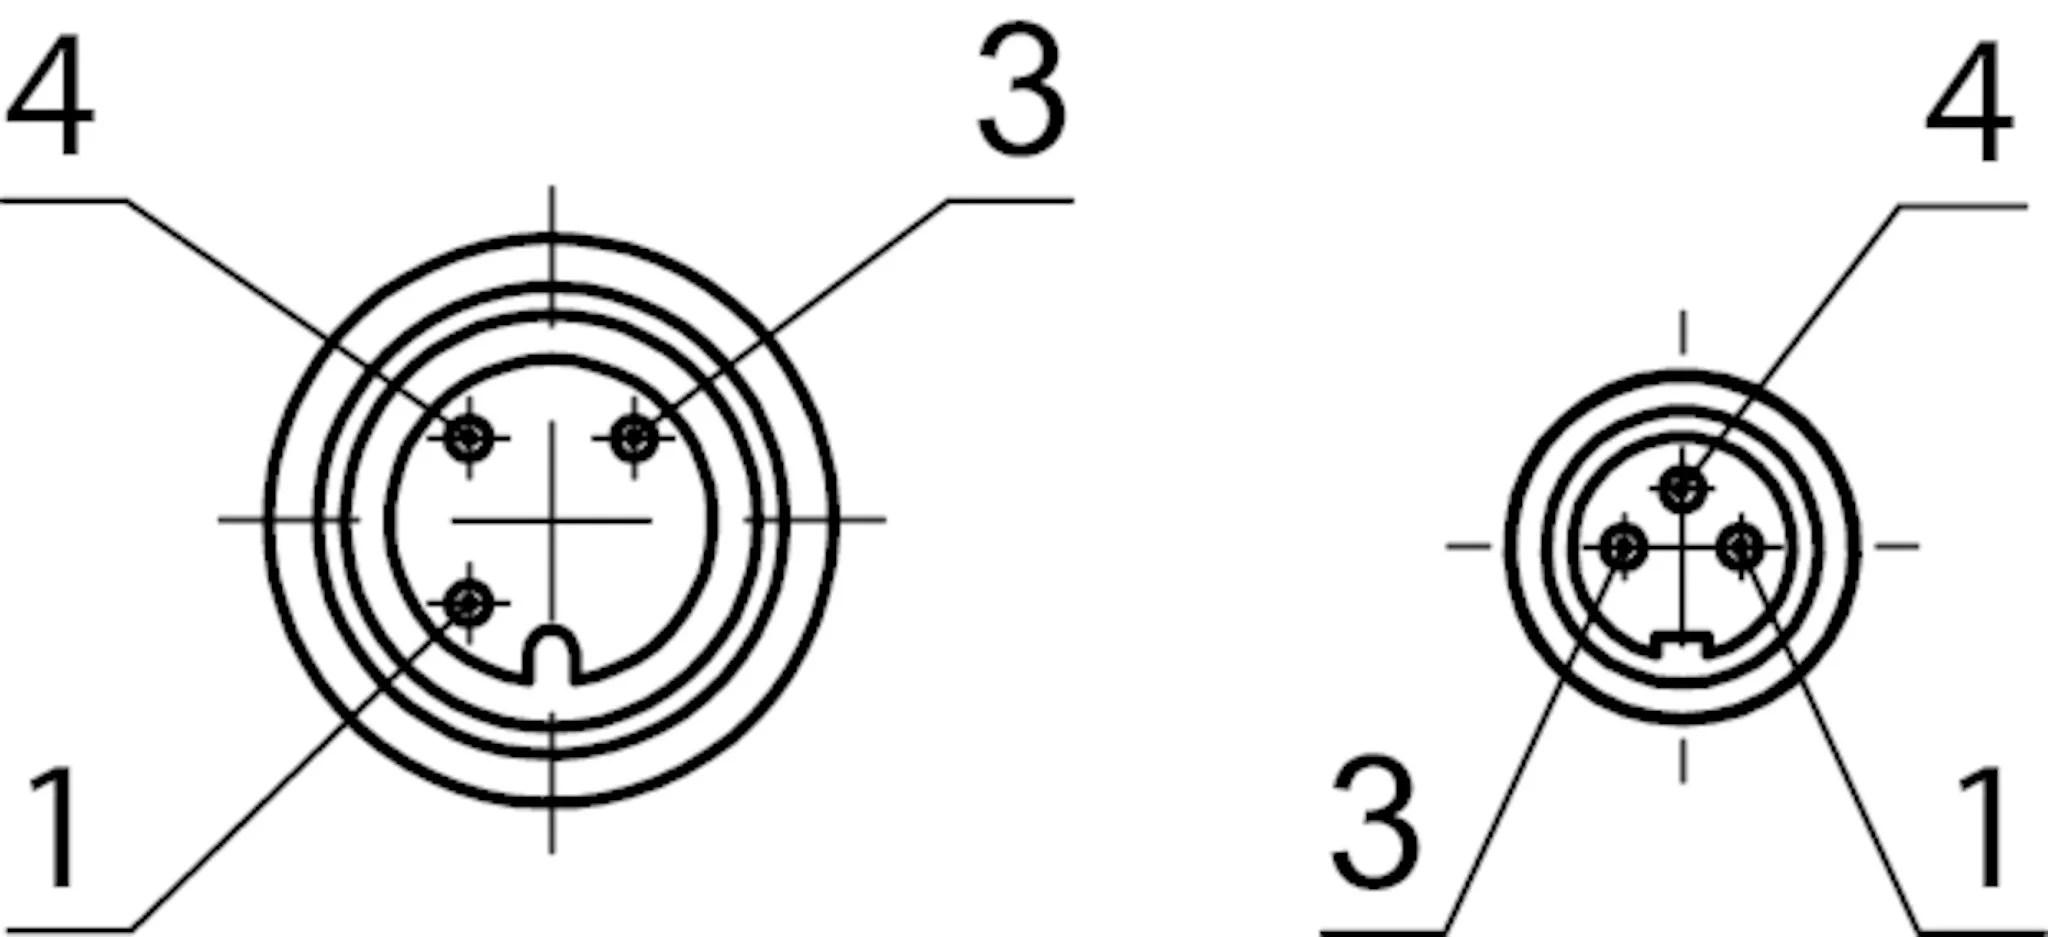 C M12m03 03x034pu01 0 M08f03